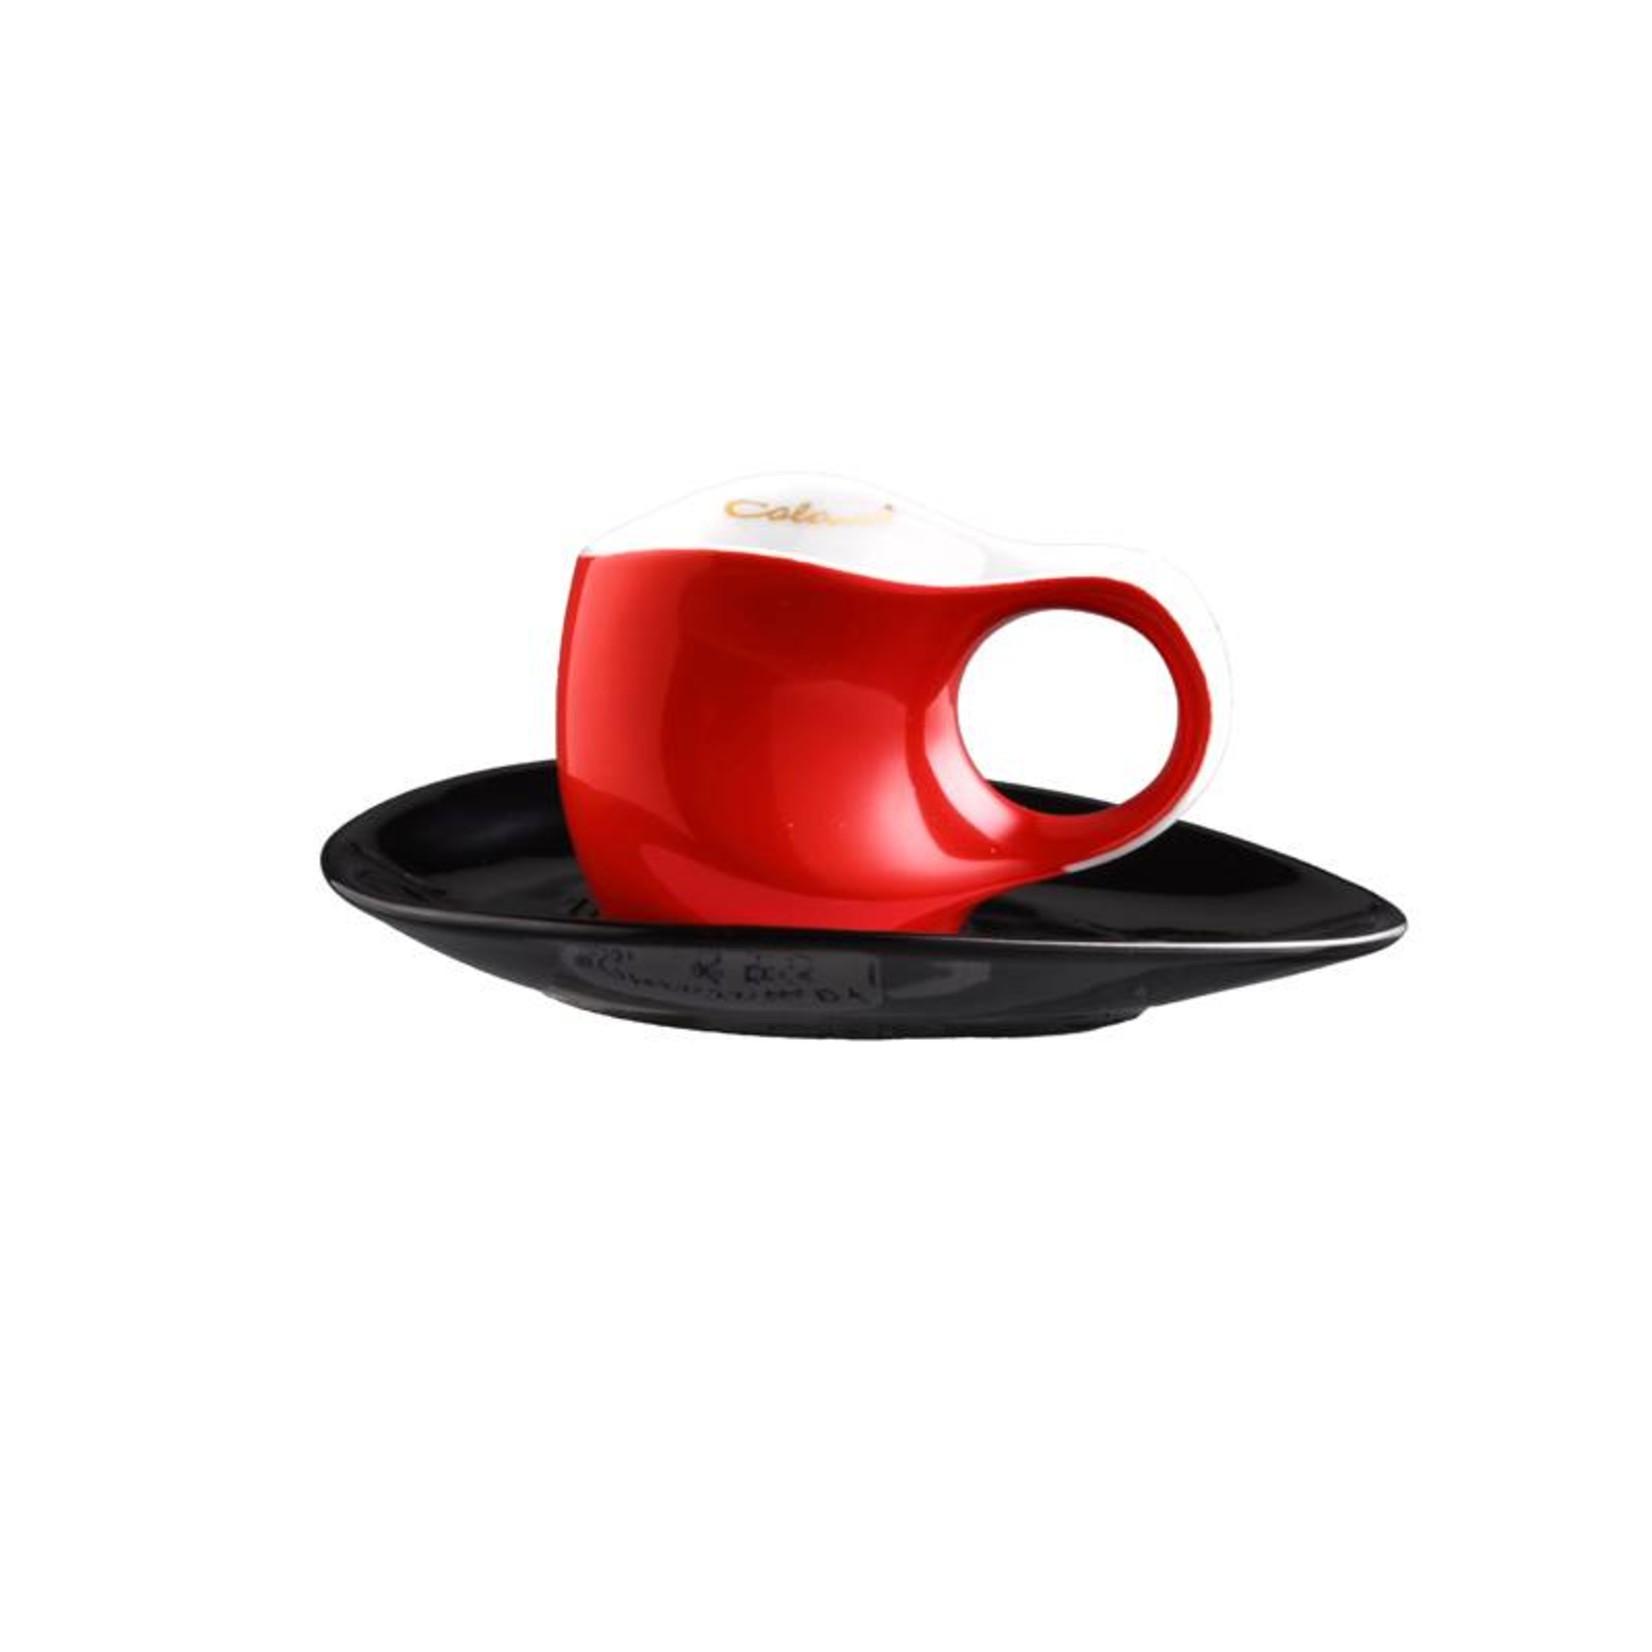 Colani Porzellanserie Colani Espressotasse | Tasse inkl. Unterteller | rot